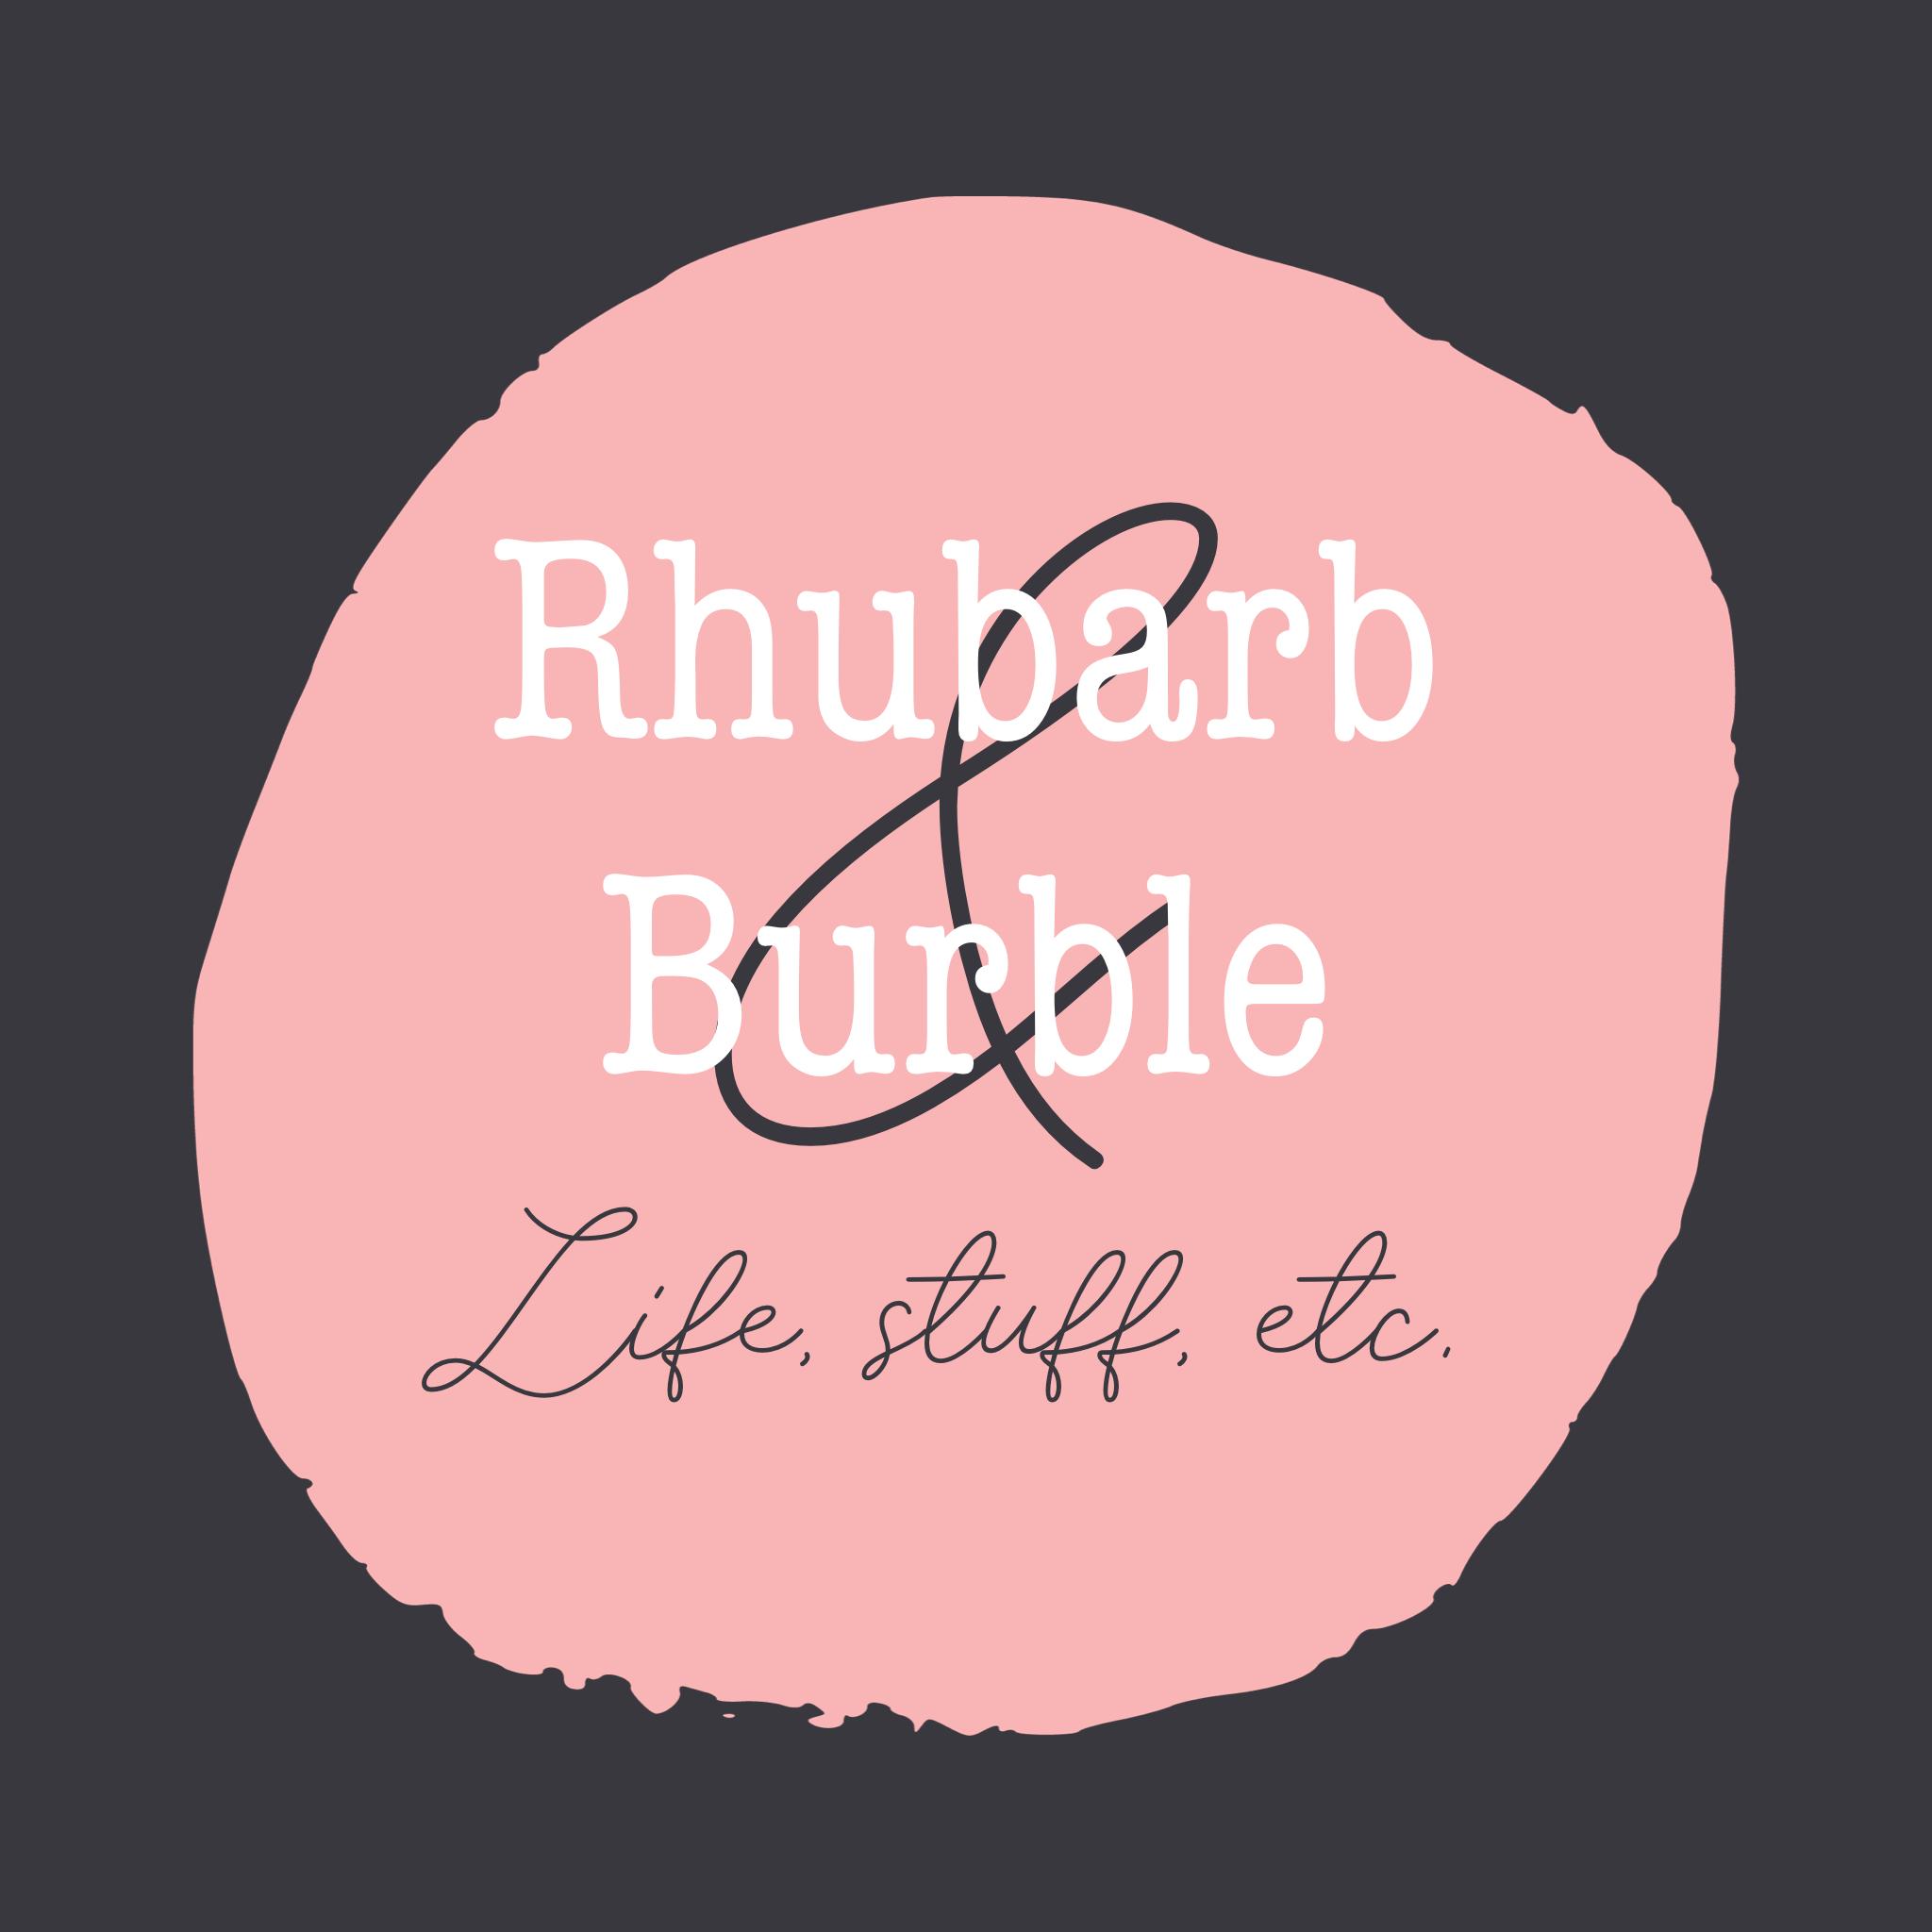 Rhubarb & Burble